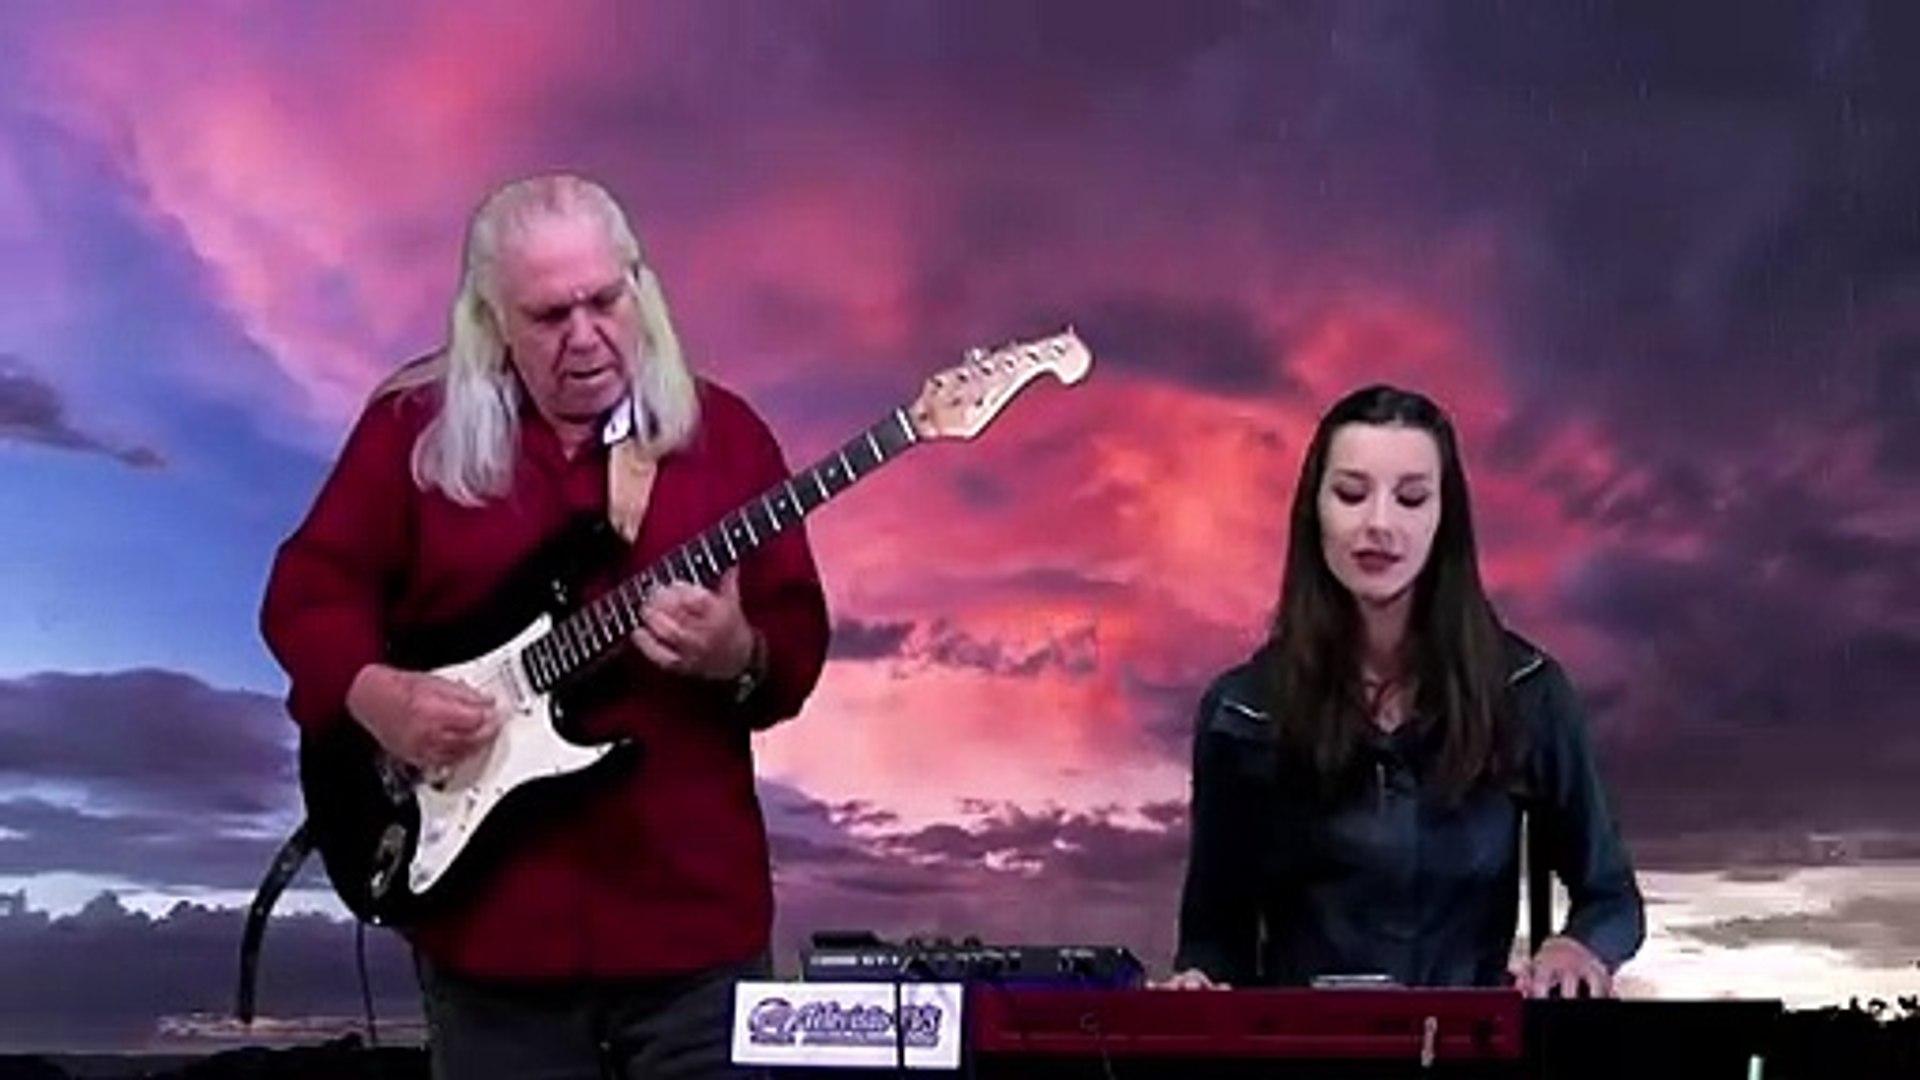 Who'll Stop The Rain (Creedence Revival) | João Lippert & Bruna Dartora